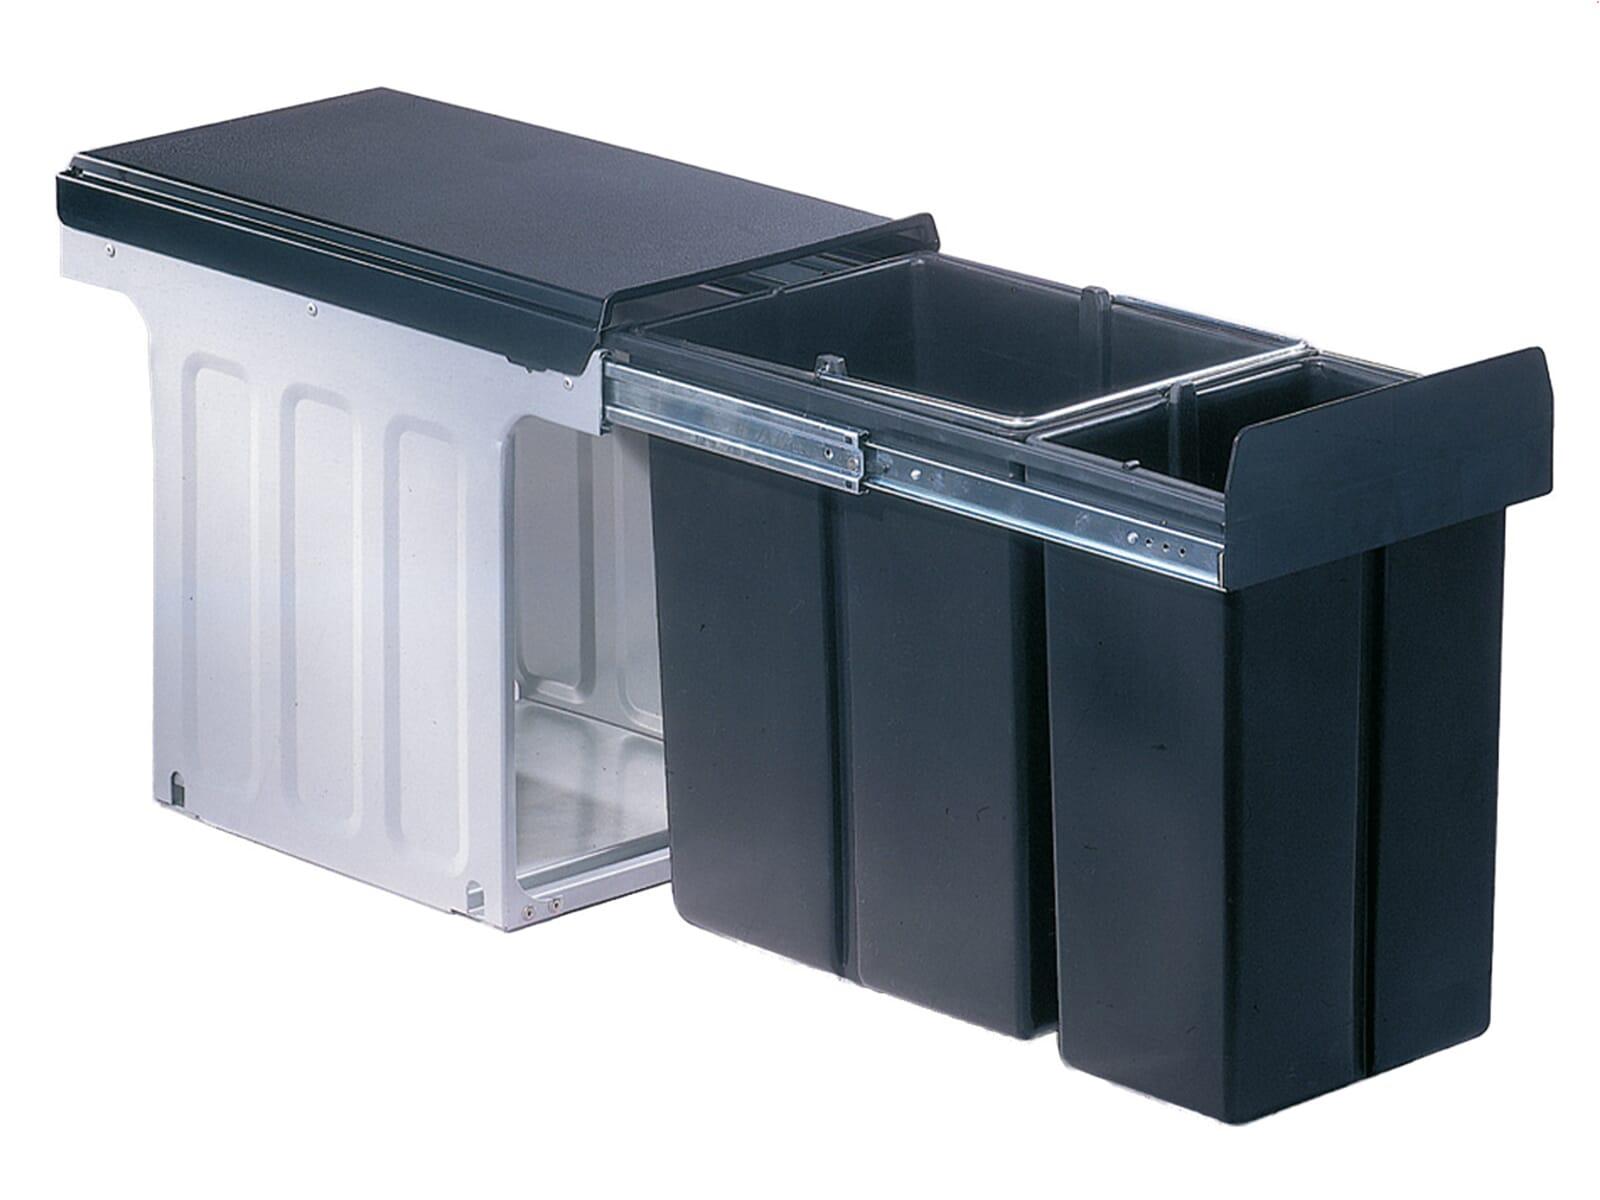 wesco bio double profi 857421 11 einbau abfallsammler. Black Bedroom Furniture Sets. Home Design Ideas